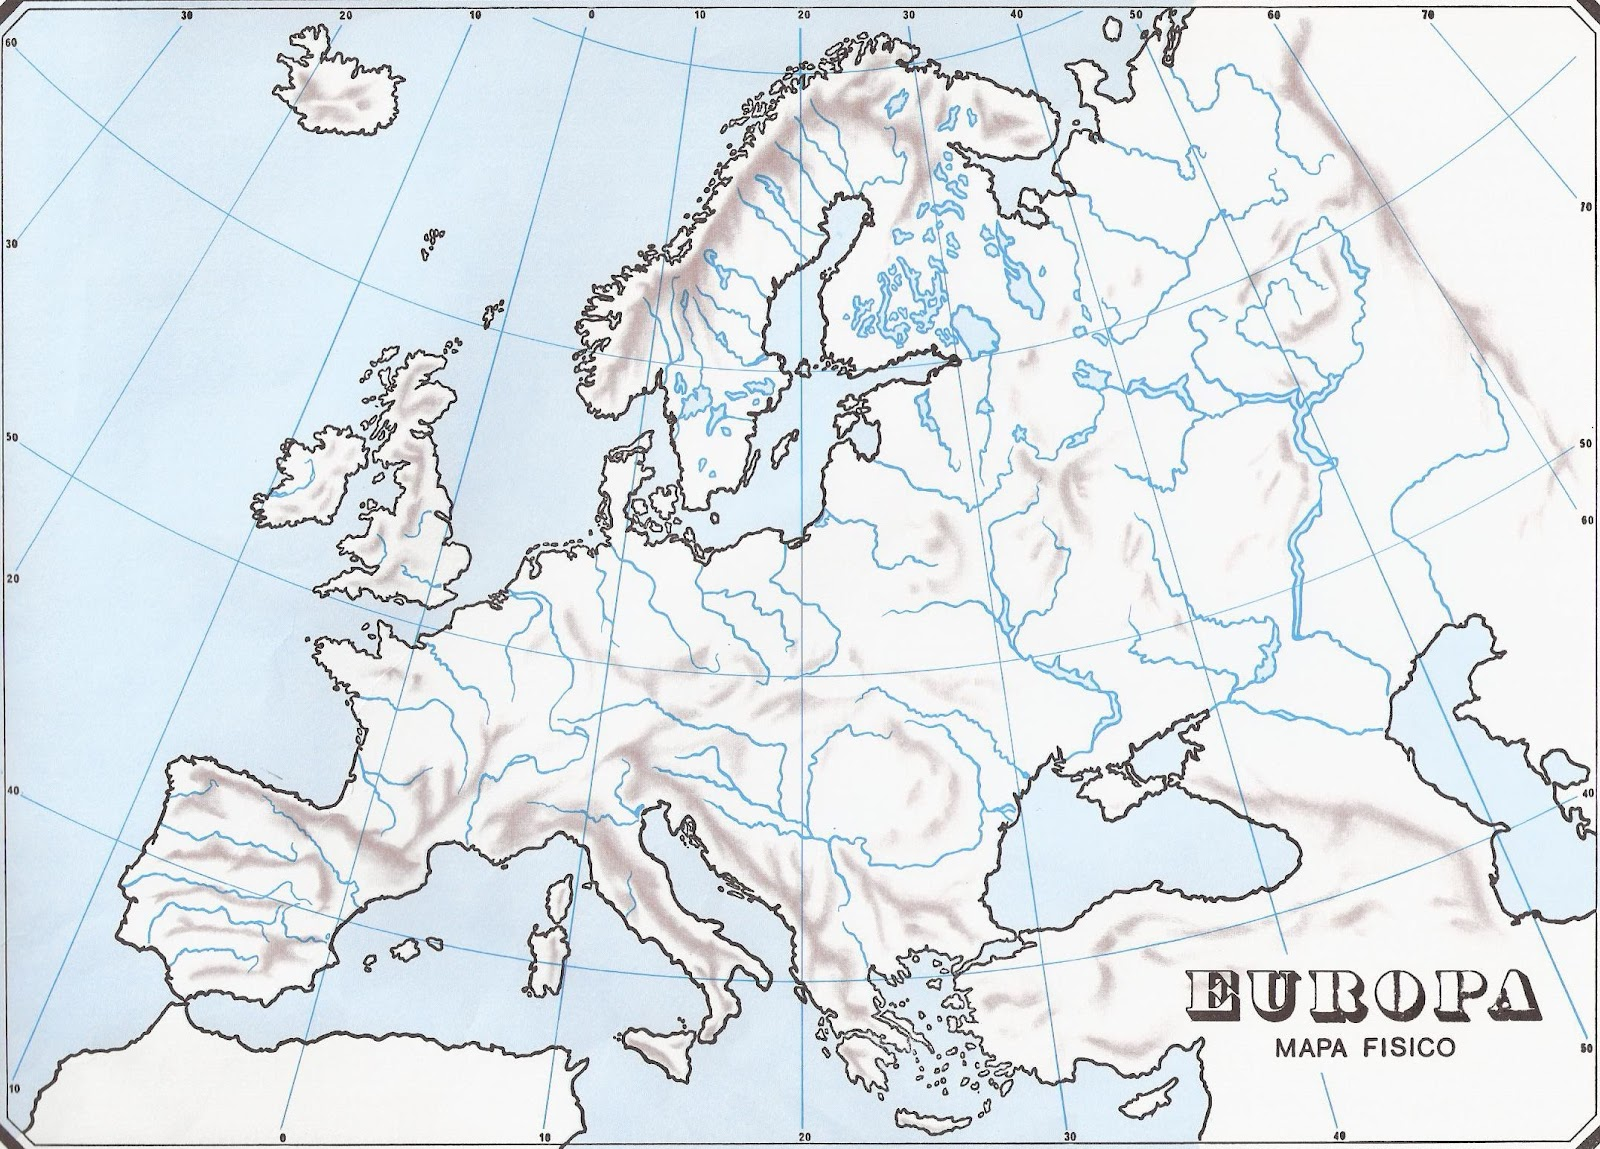 GEOGRAFA 3 ESO  MAPA INTERACTIVO DE EUROPA ROS Y LAGOS